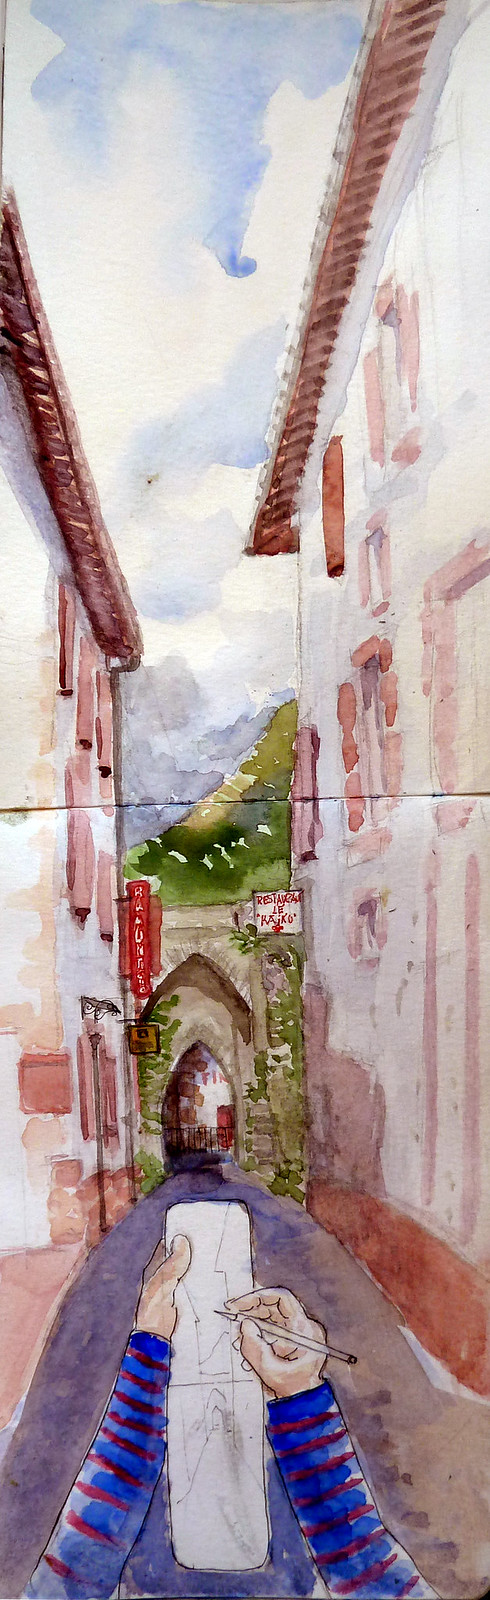 47th Sketchcrawl Donibane Garazi/ Saint Jean-Pied-de-Port